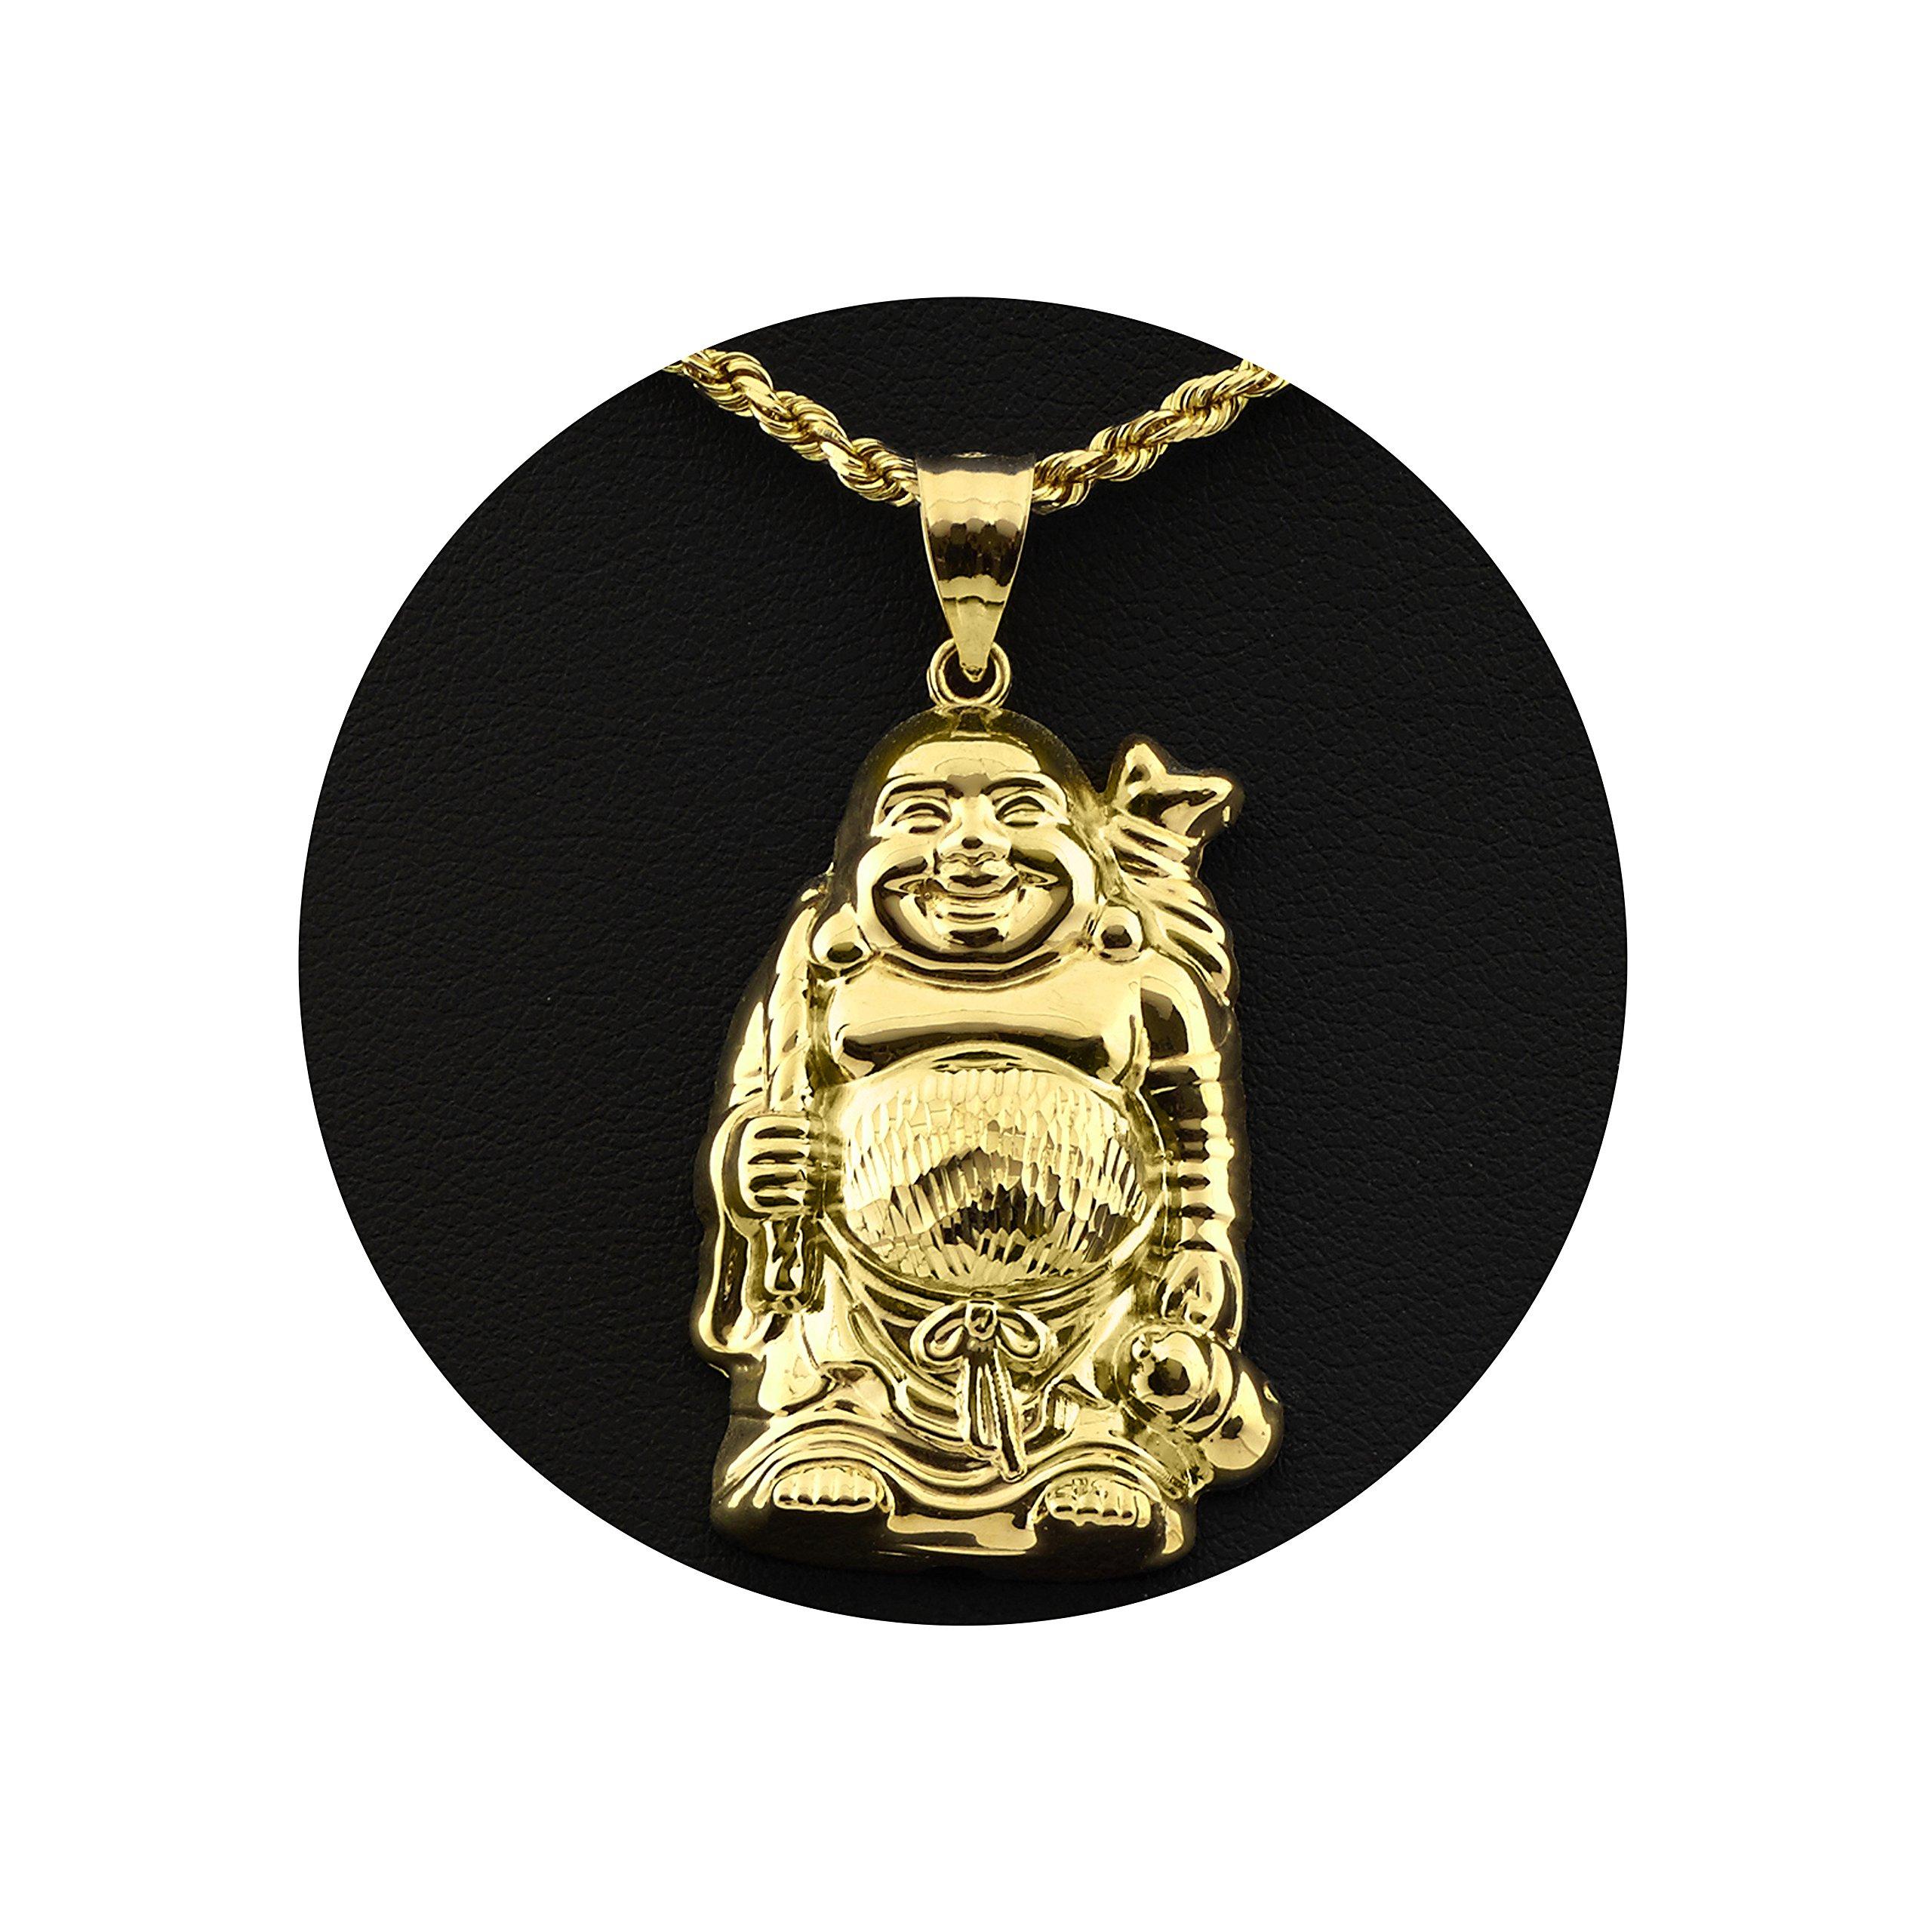 LoveBling 10K Yellow Gold Happy Buddha Diamond Cut Charm Pendant (1.77'' x 0.95'')